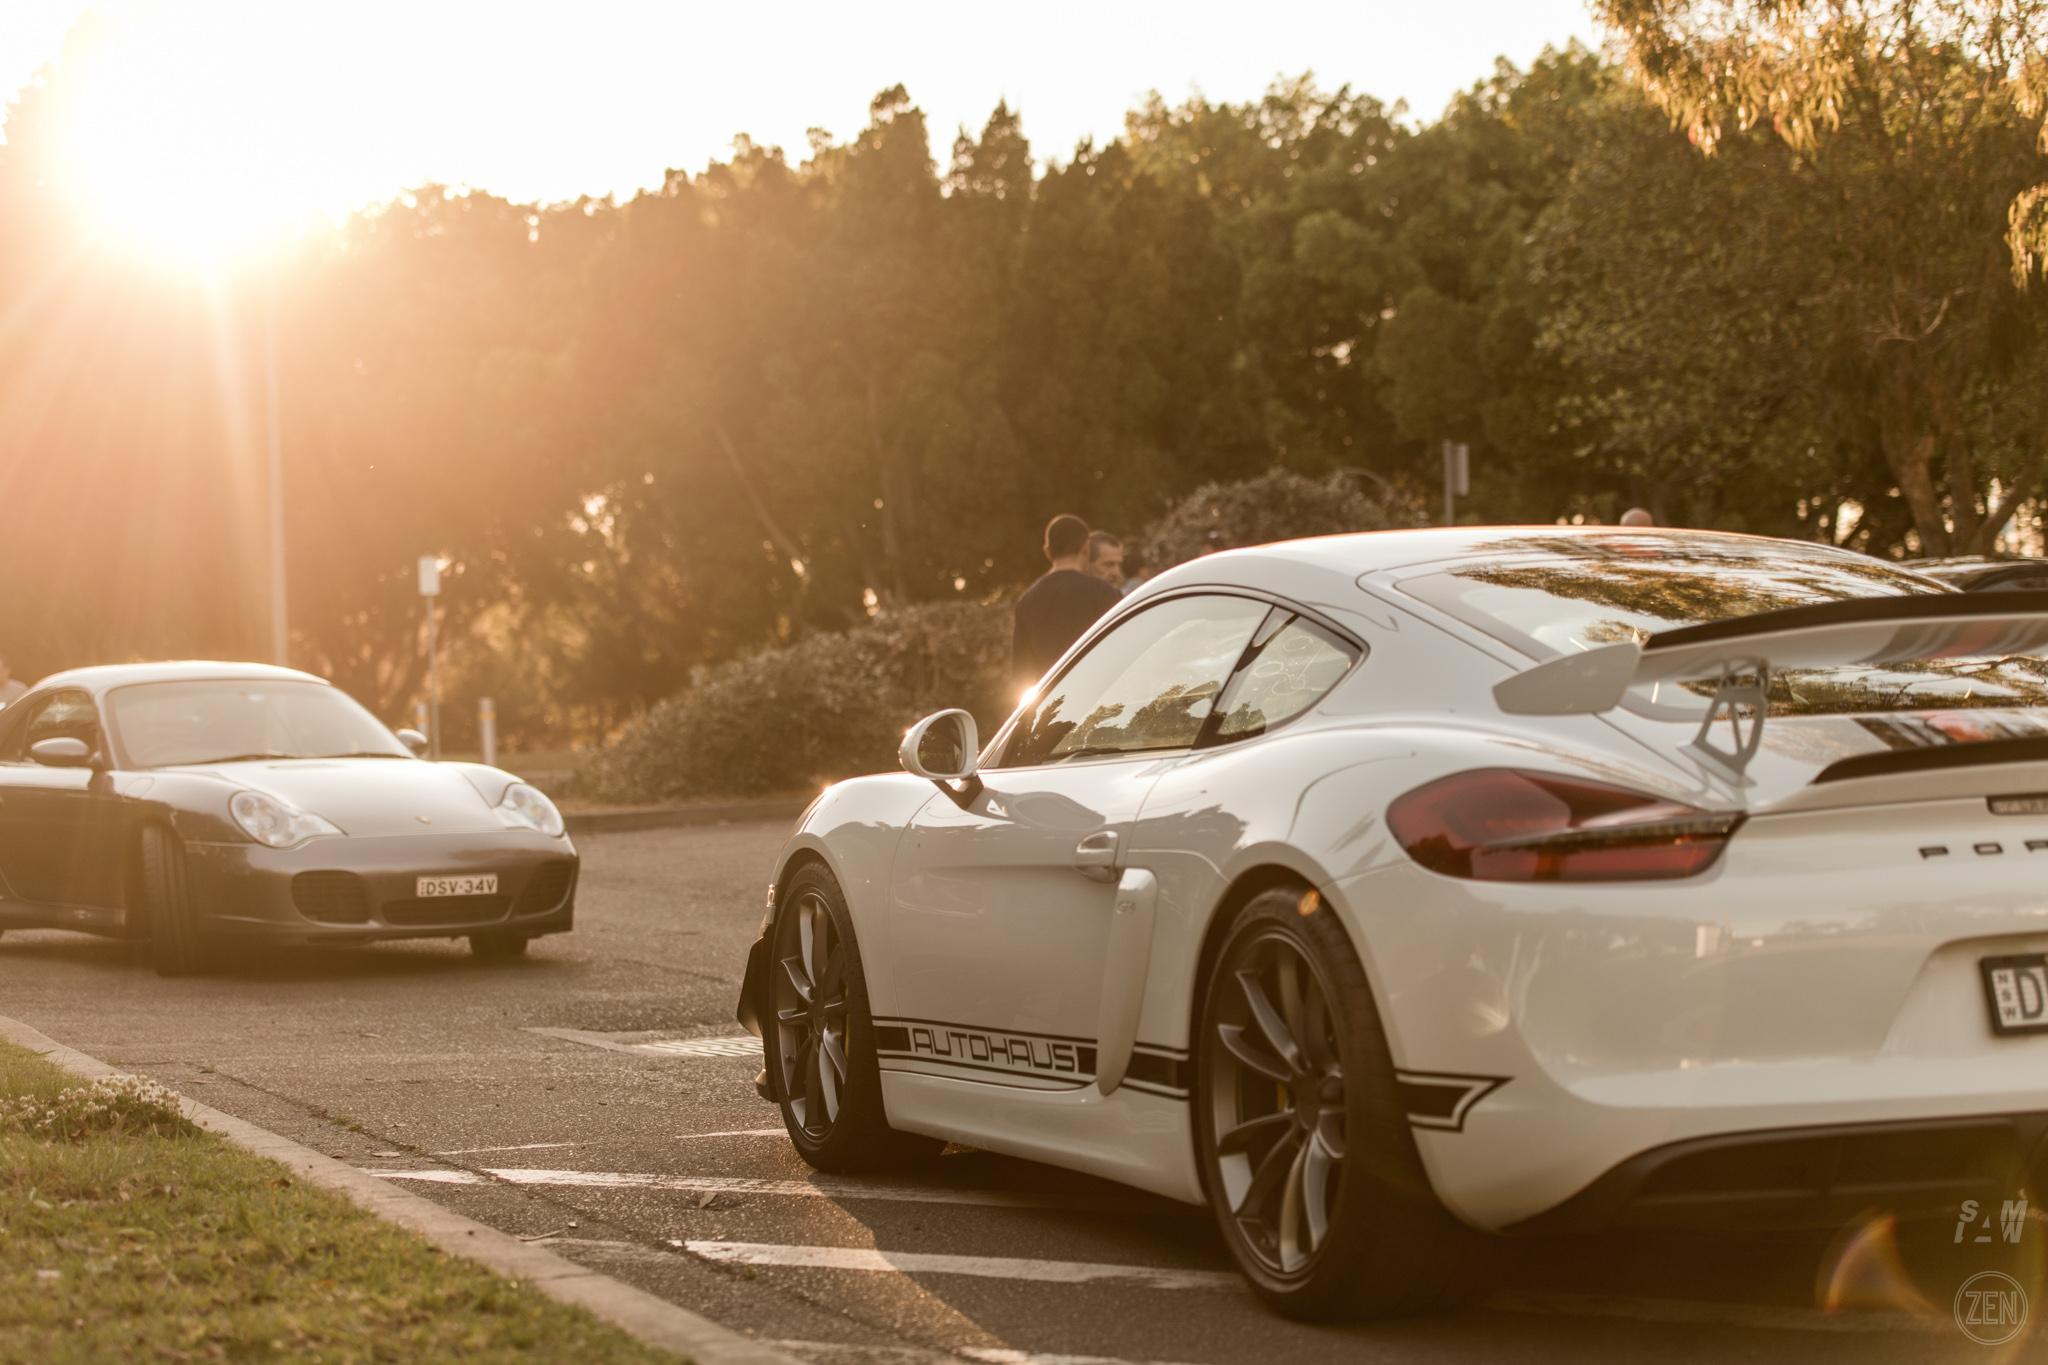 2019-10-27 - Autohaus Porsches & Coffee 029